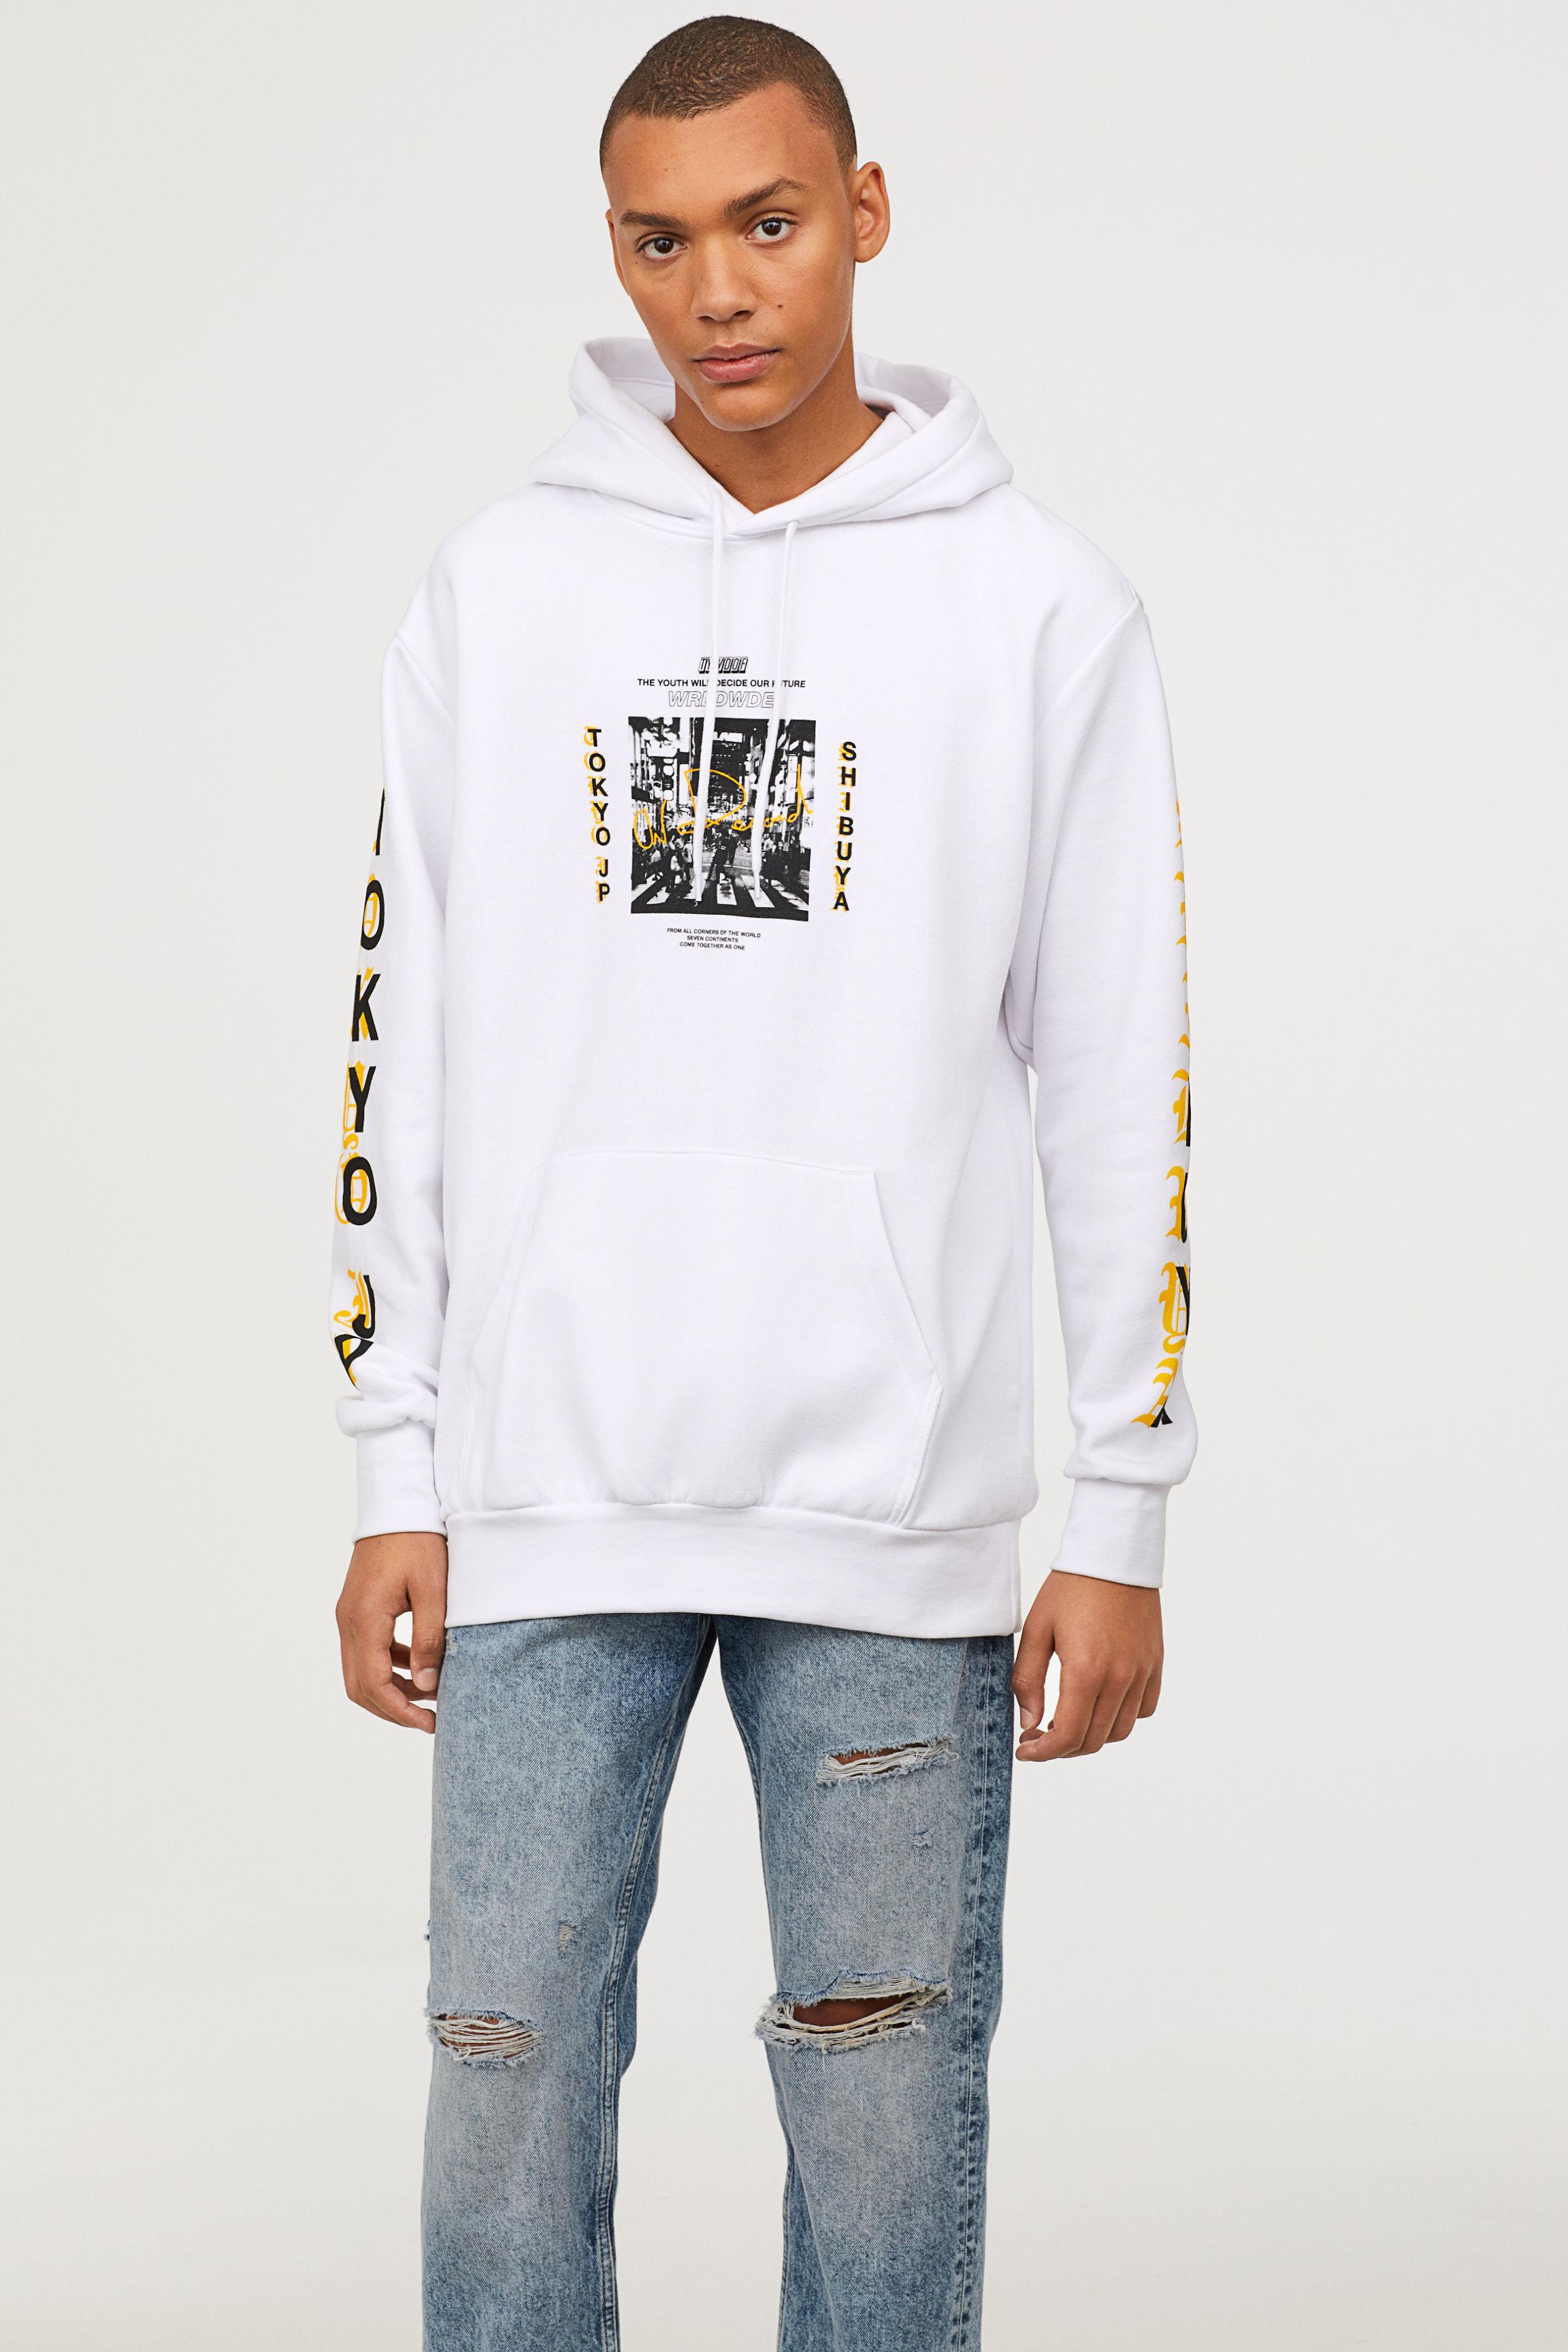 e3c9b38ce H&M Hooded Sweatshirt in White for Men - Lyst